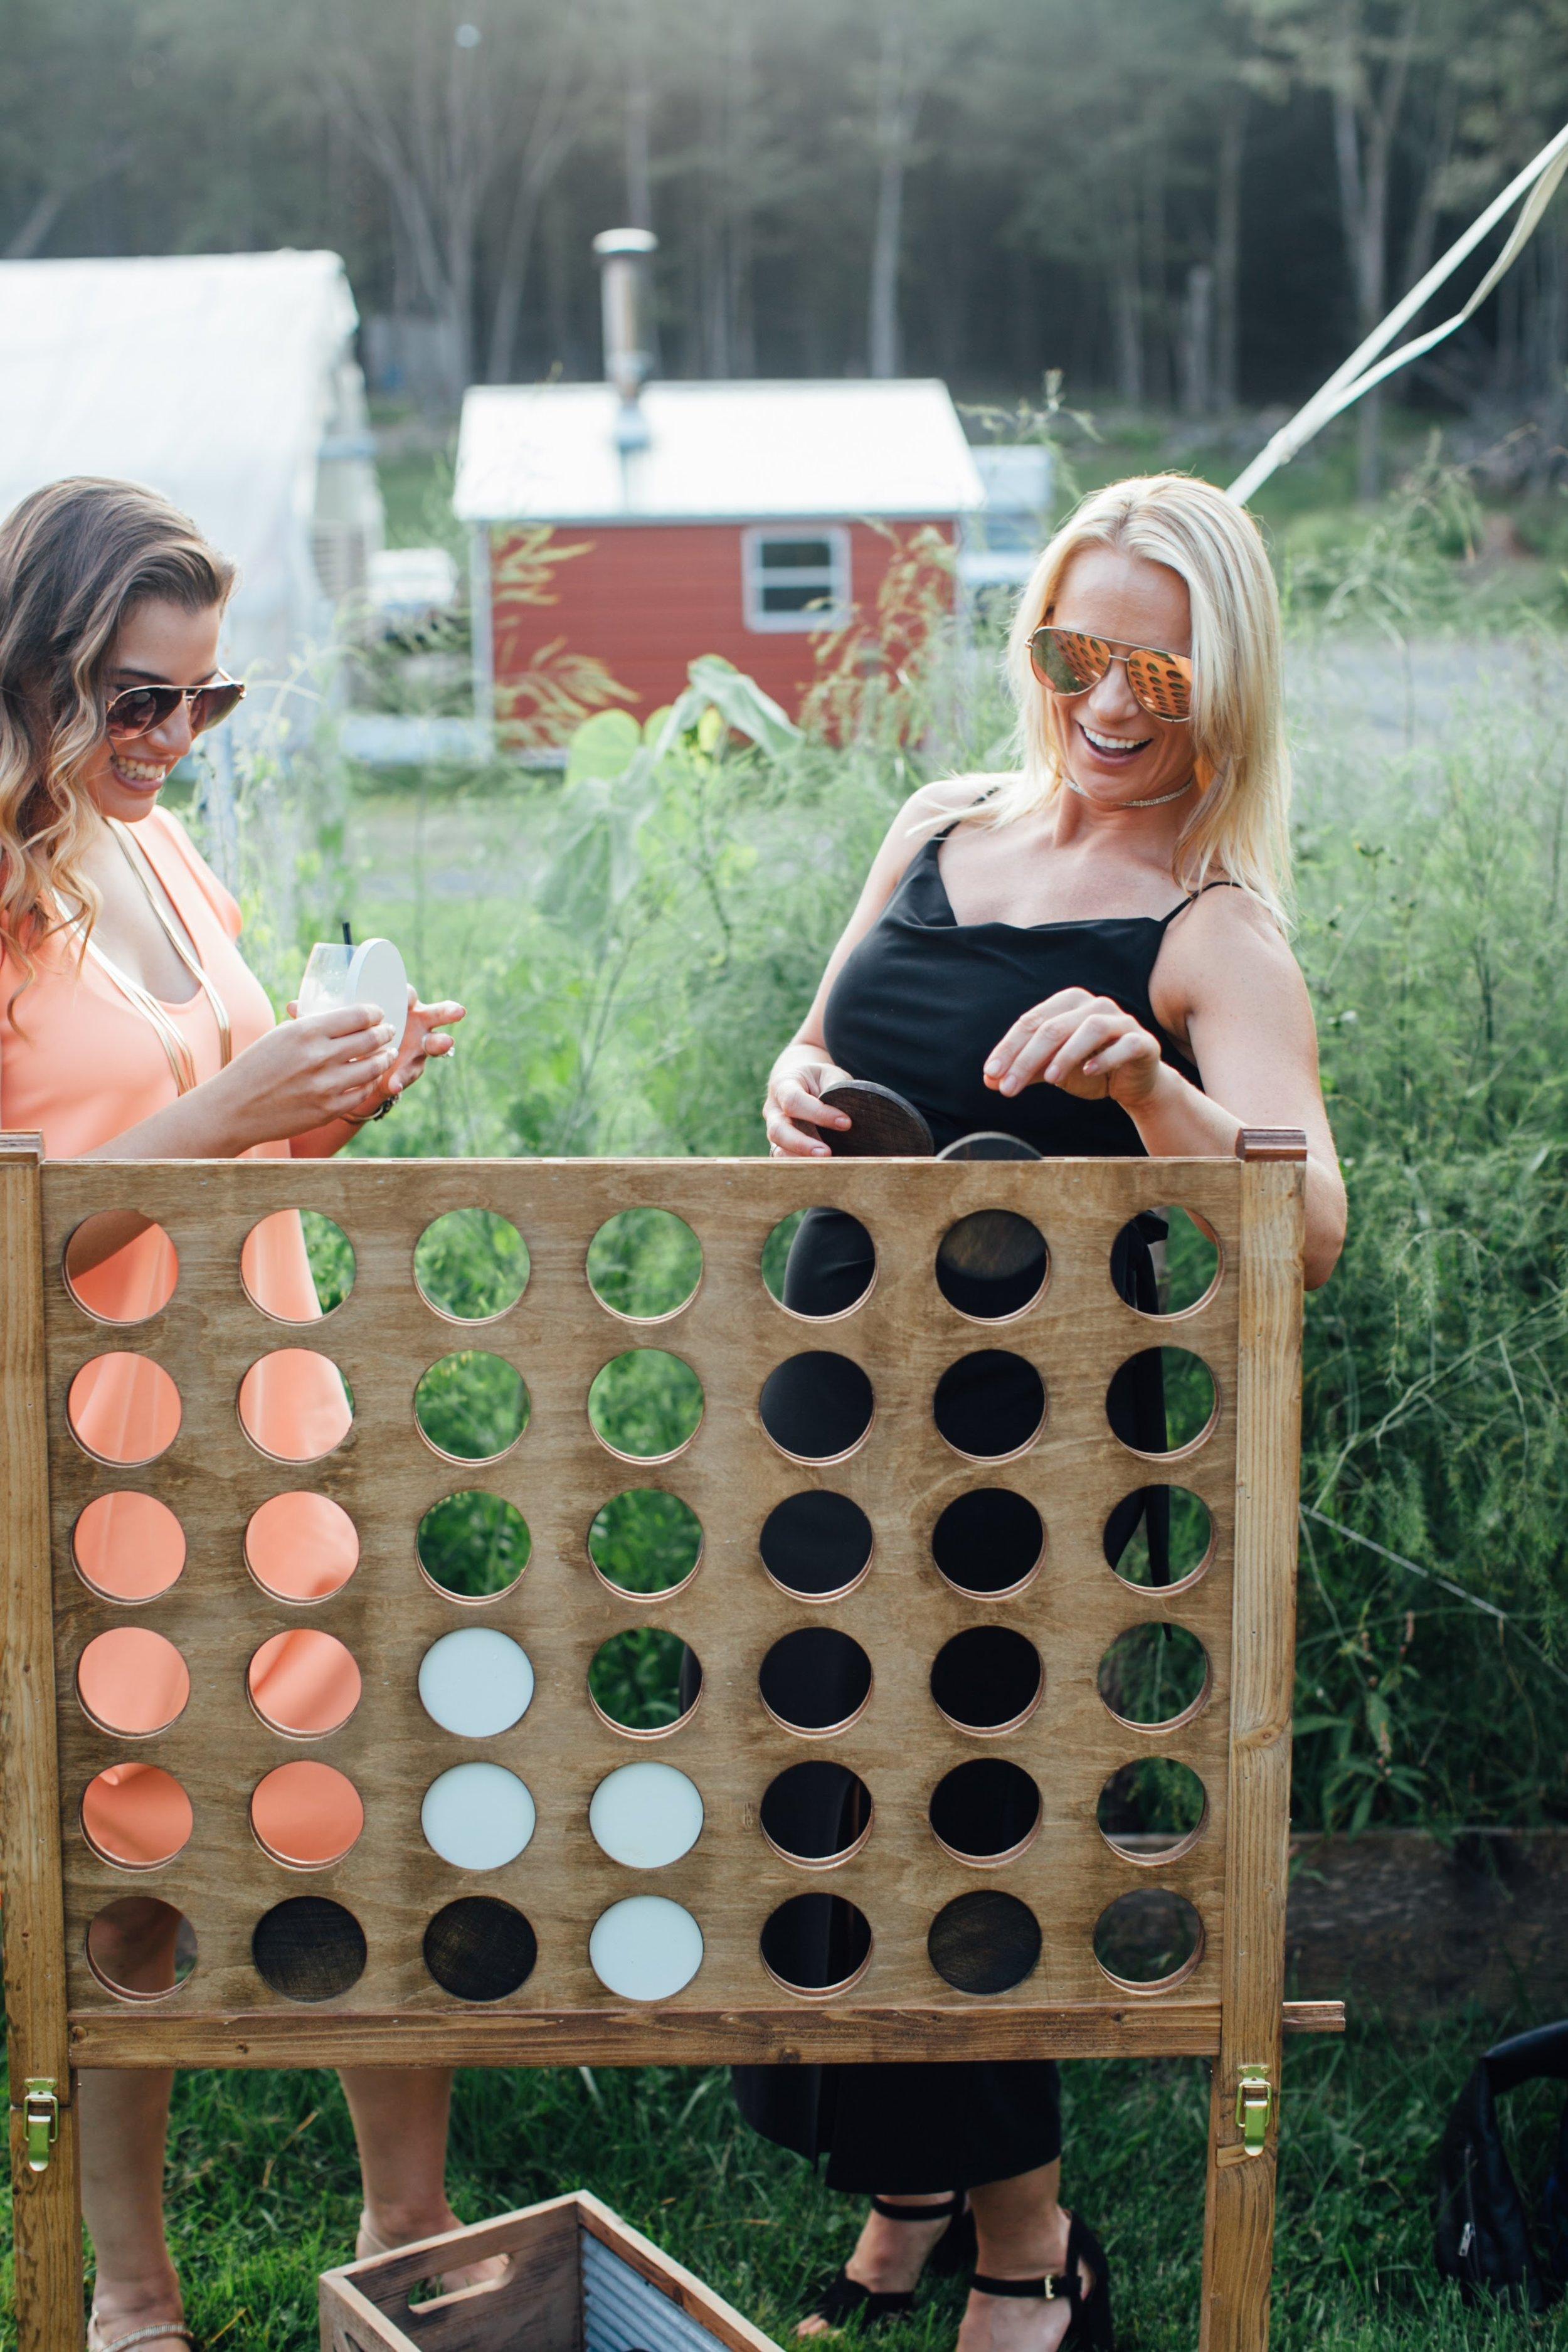 Courtney + Matt Blenheim Hill Farm Catskills NY Wedding Veronica Lola Photography 2017-504.jpg